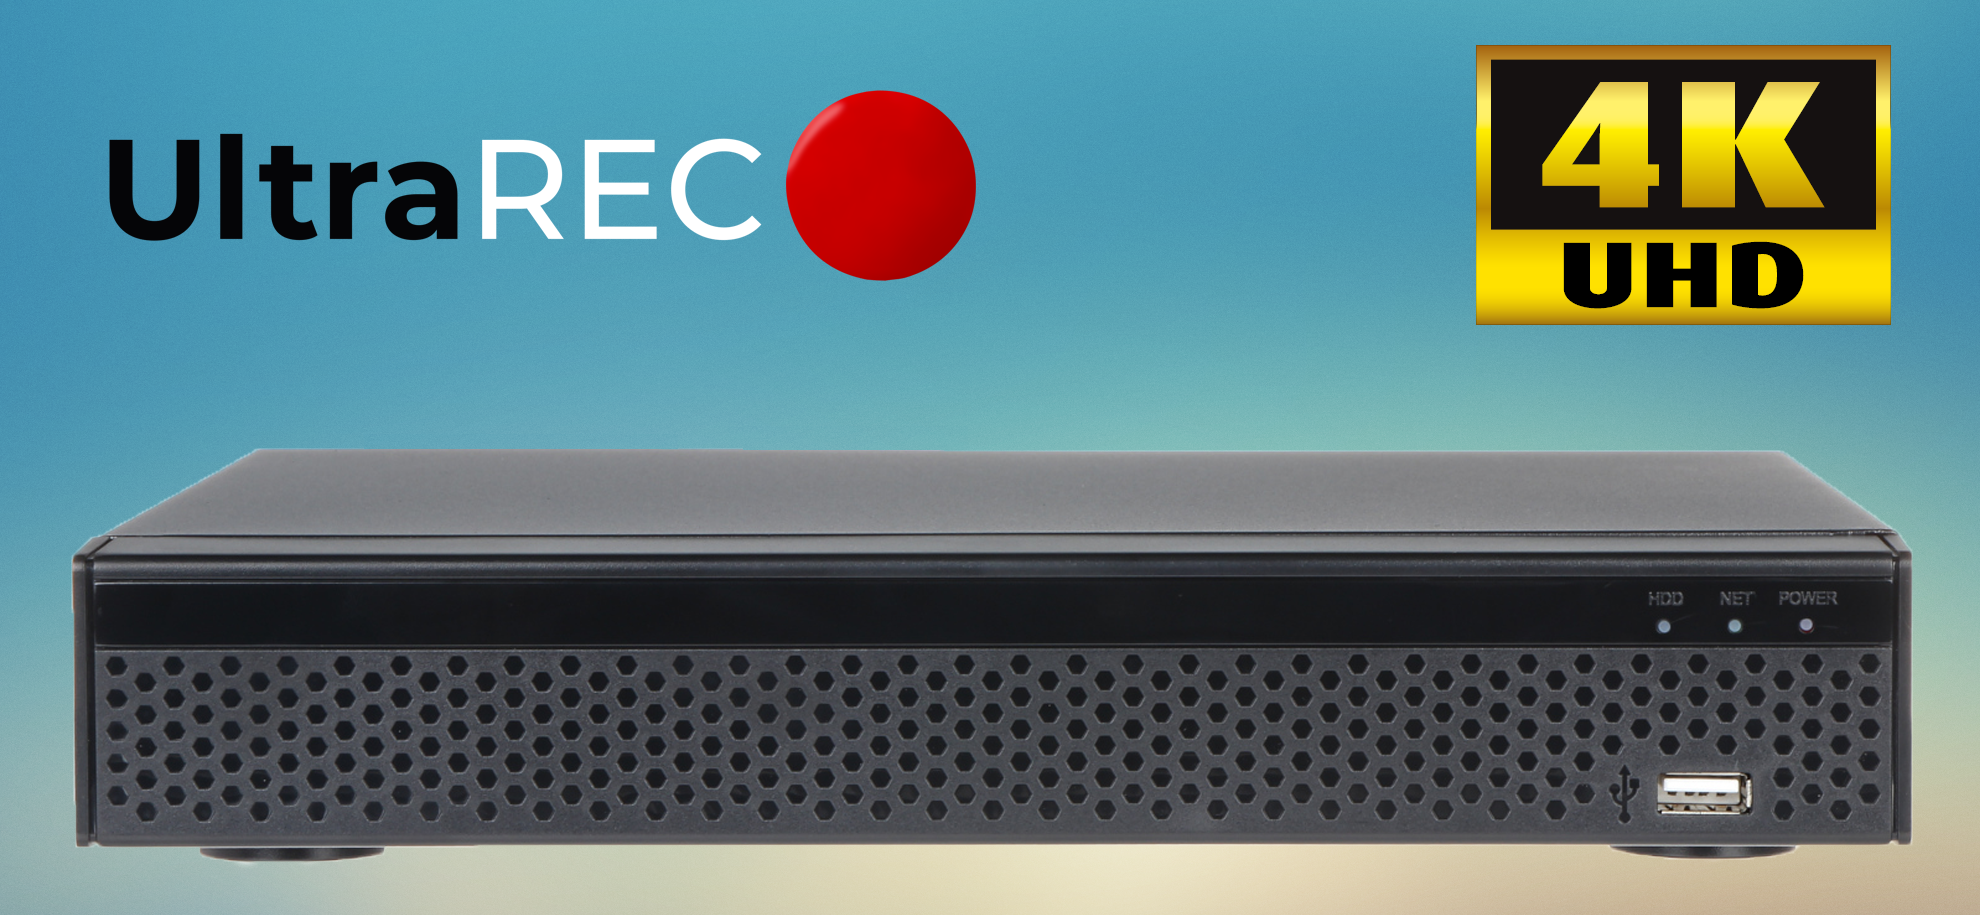 Rejestrator UltraREC